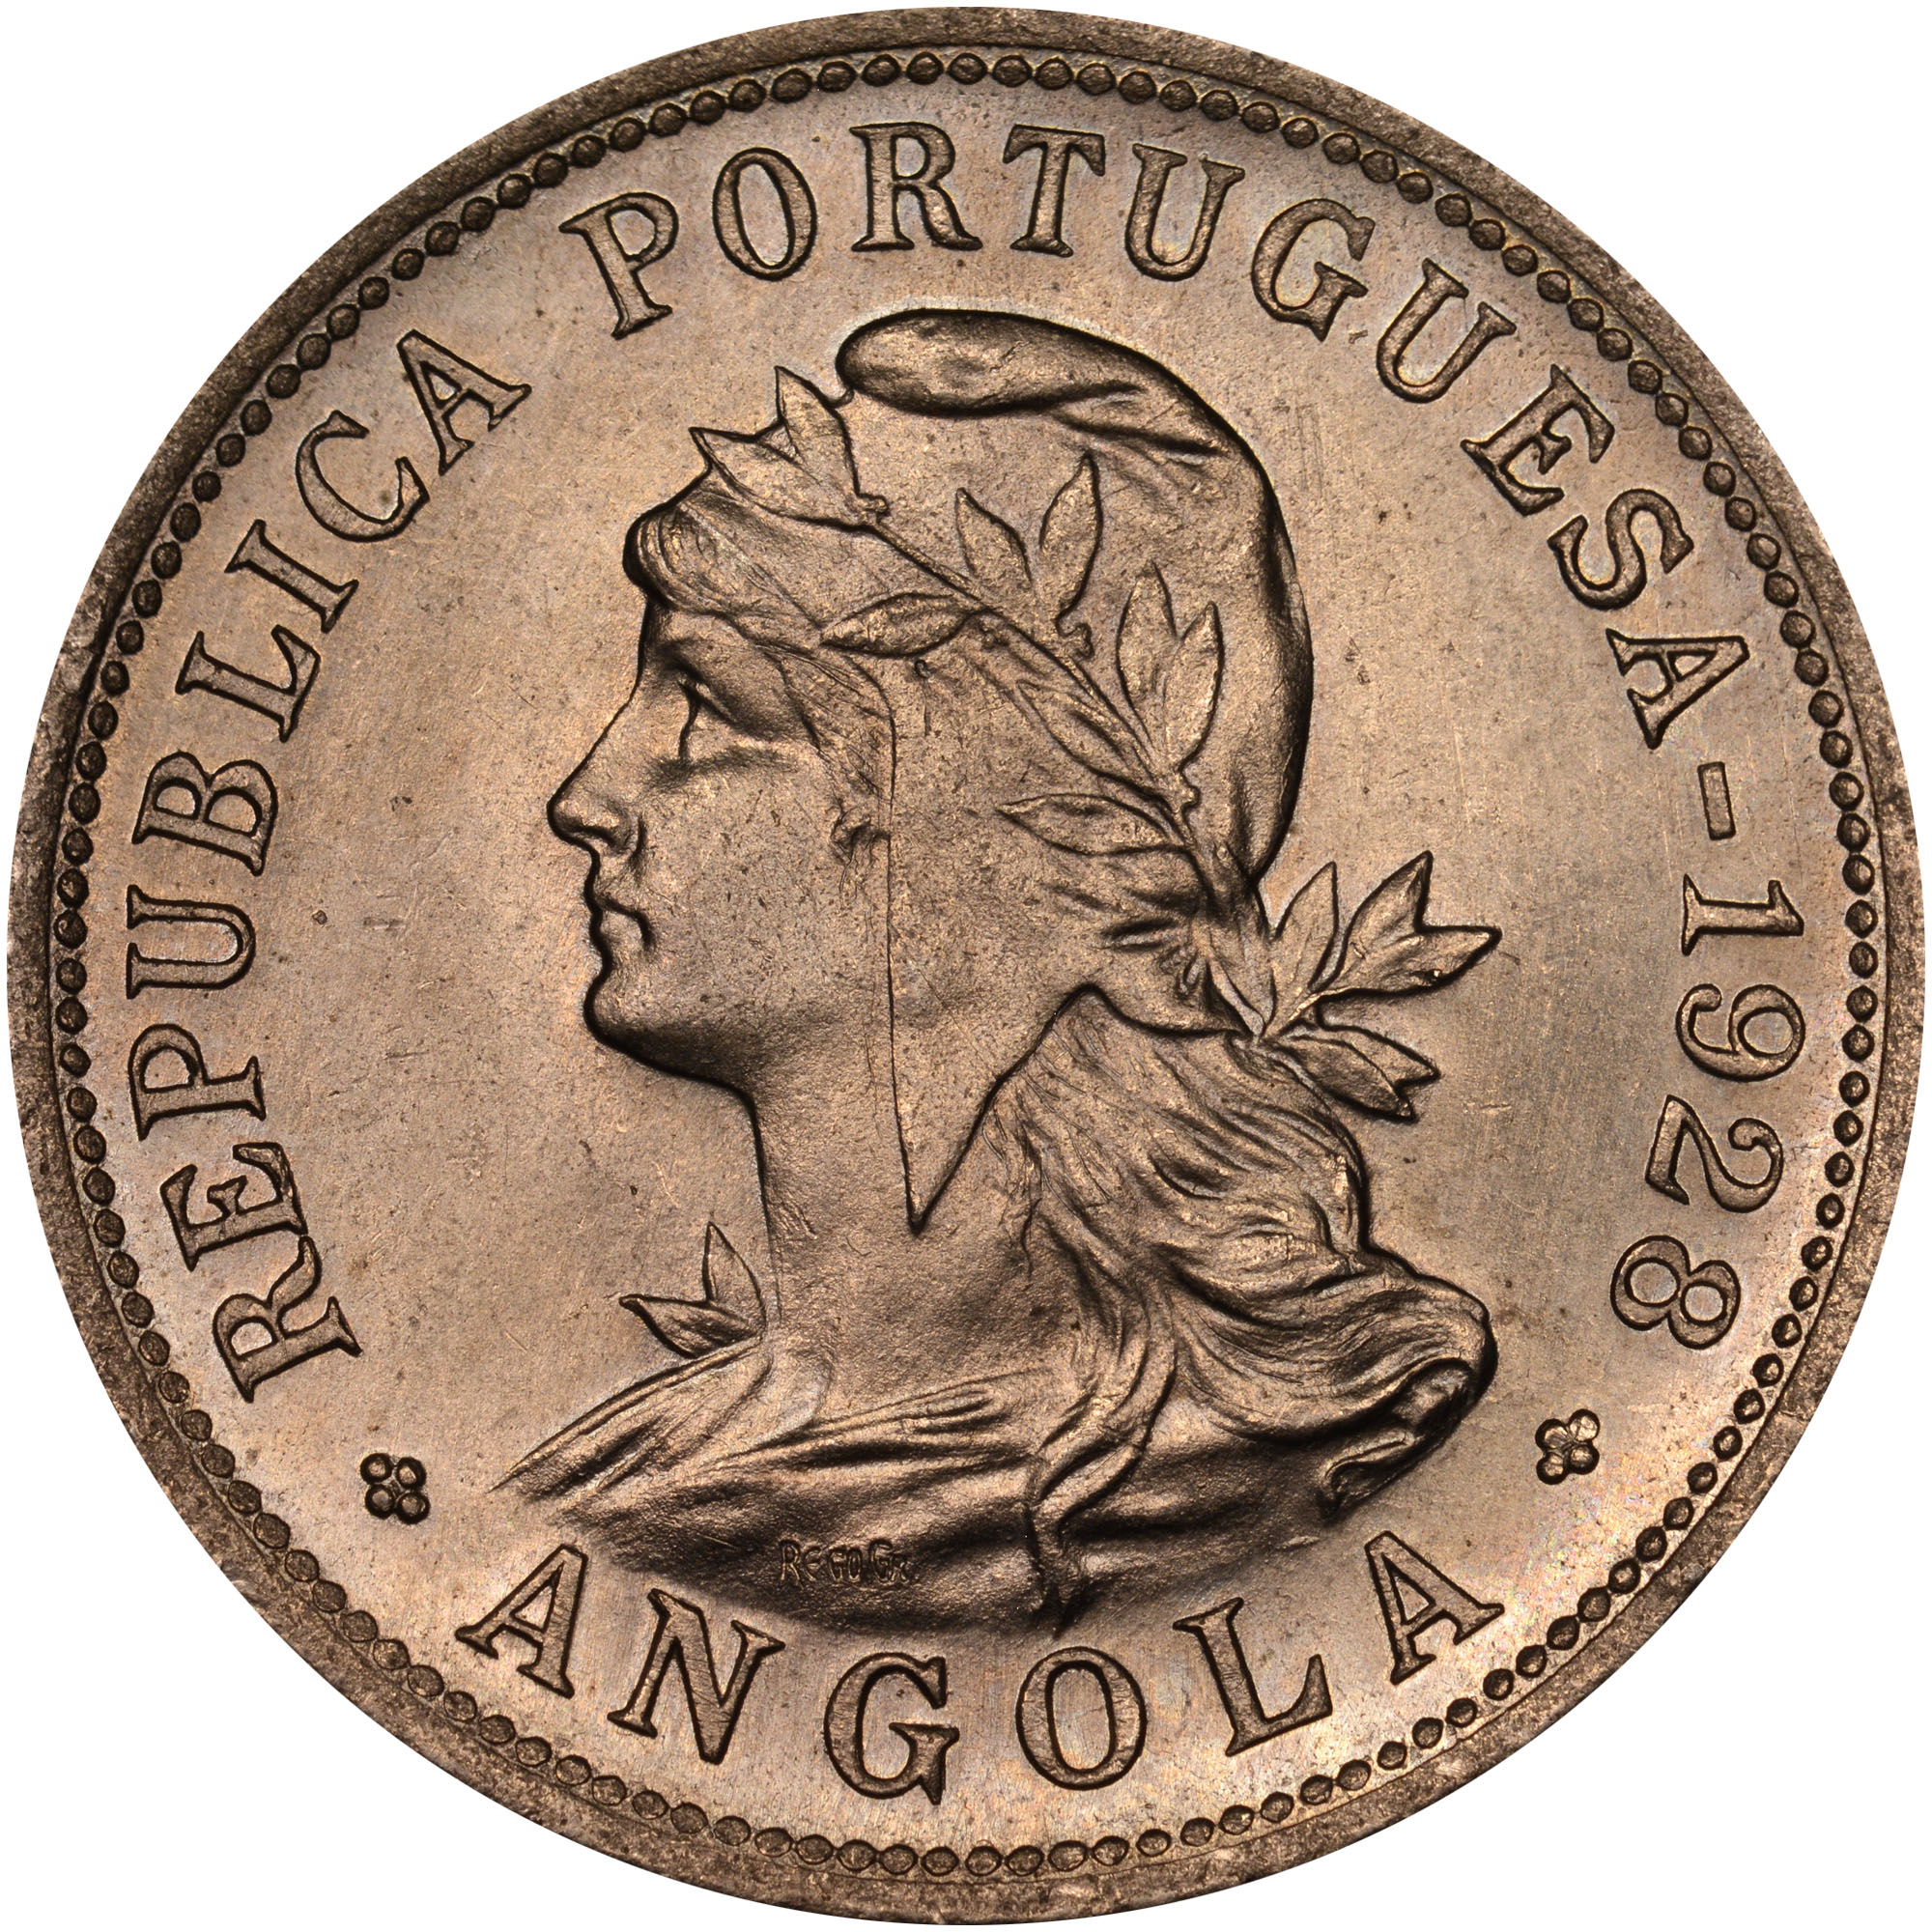 1927-1928/7 Angola 50 Centavos obverse